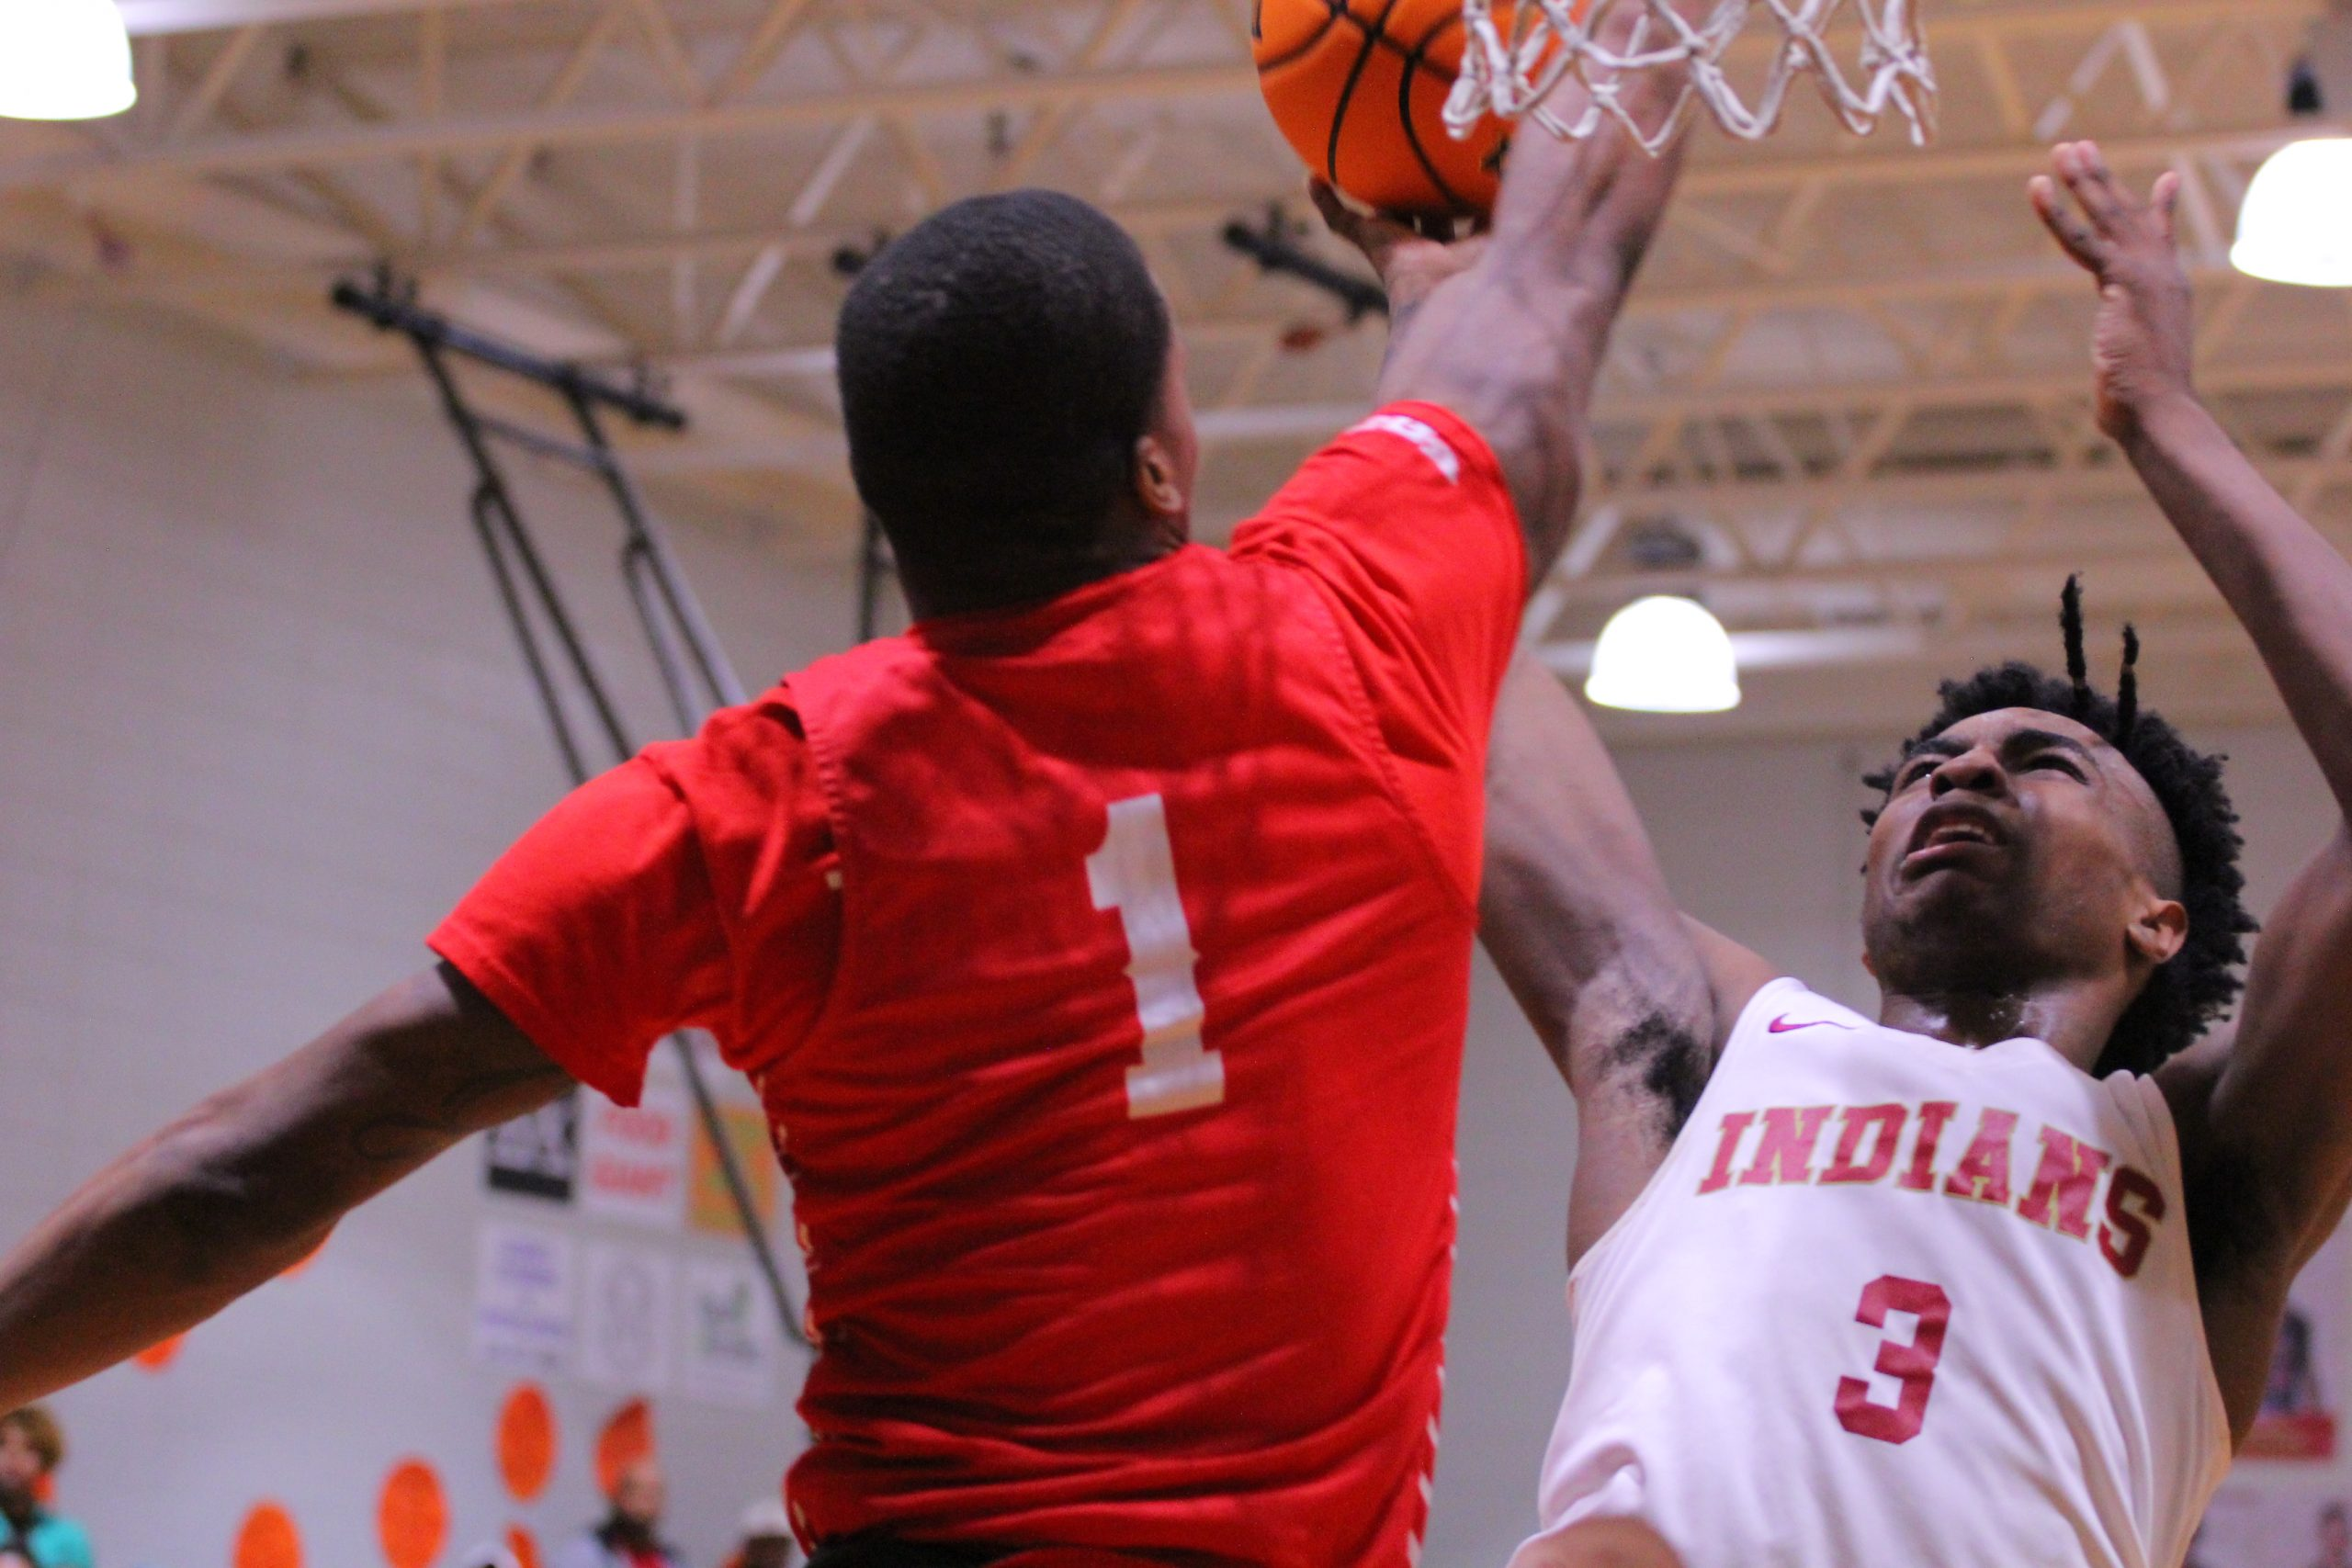 Alabama basketball standout Jamari Smith drowns in lake